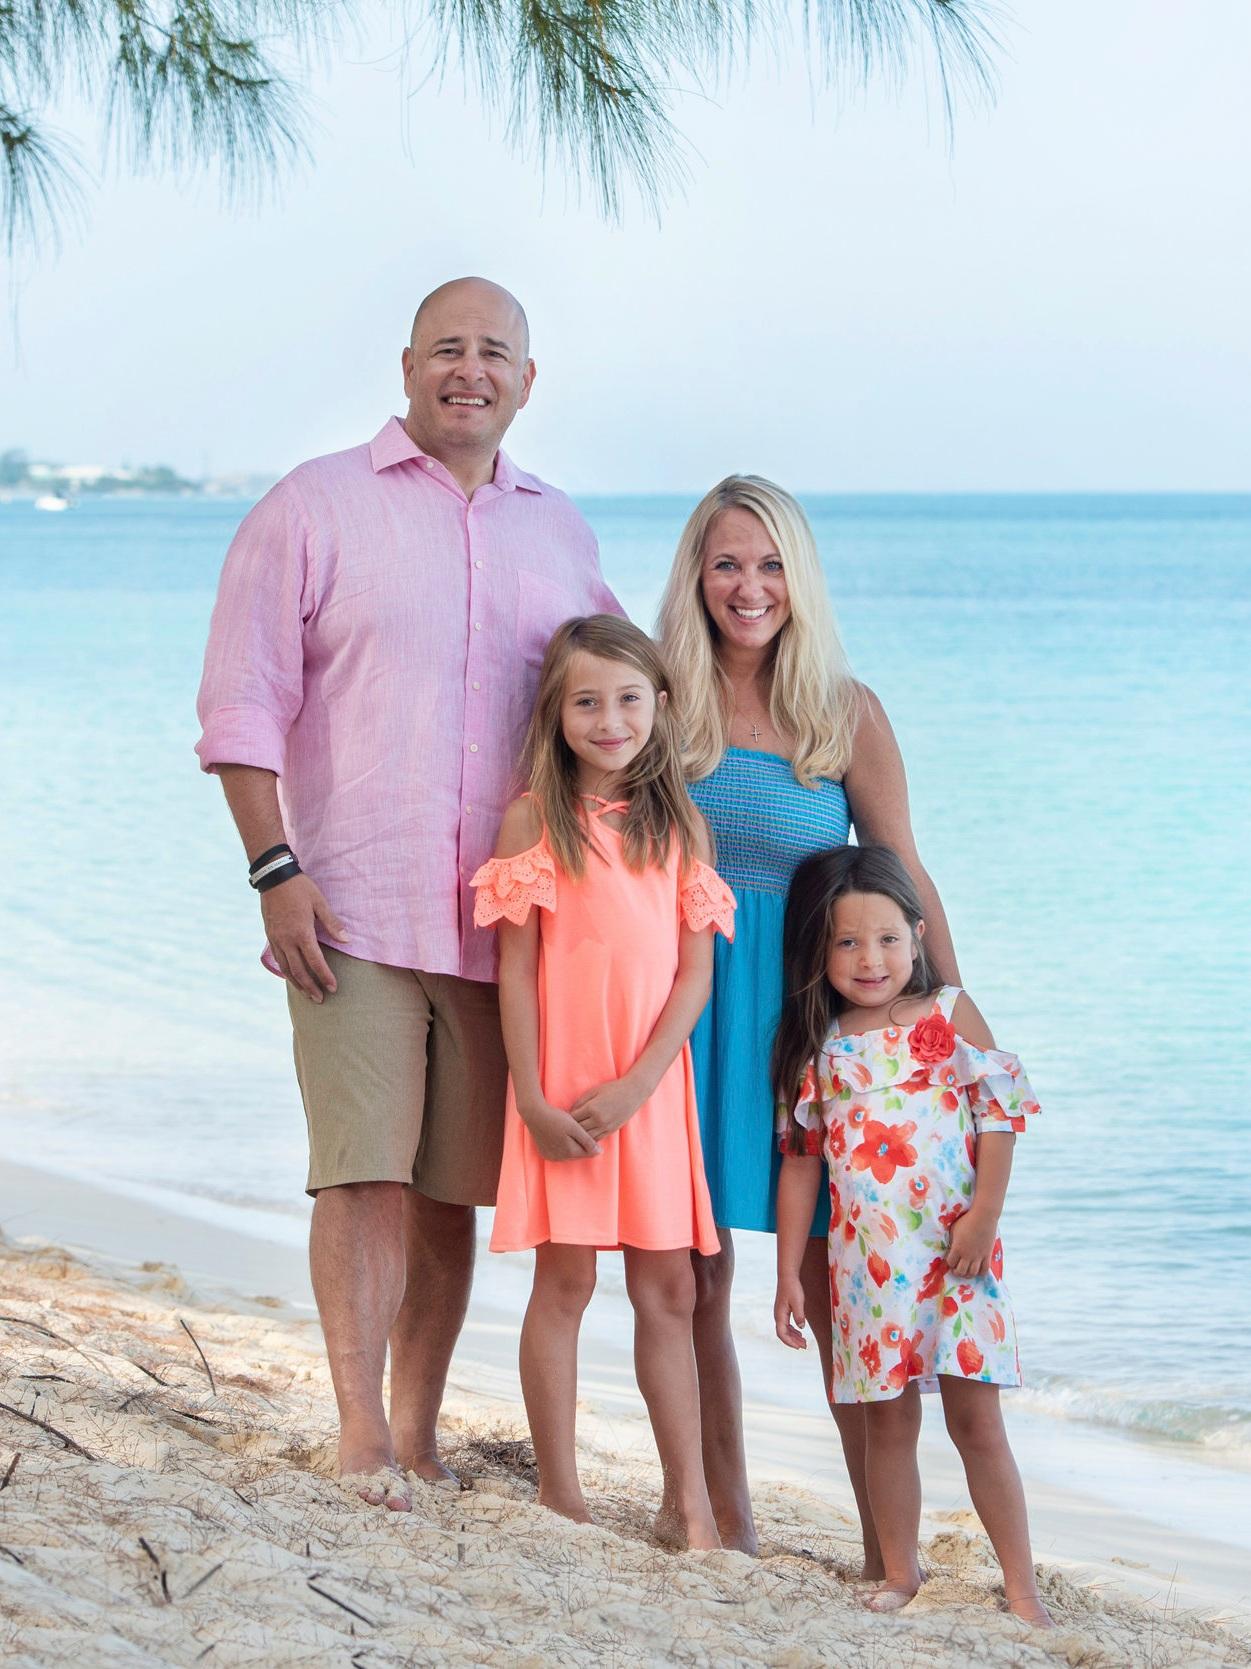 Kori Sean adopting adopt adoptive parents birth mother open adoption